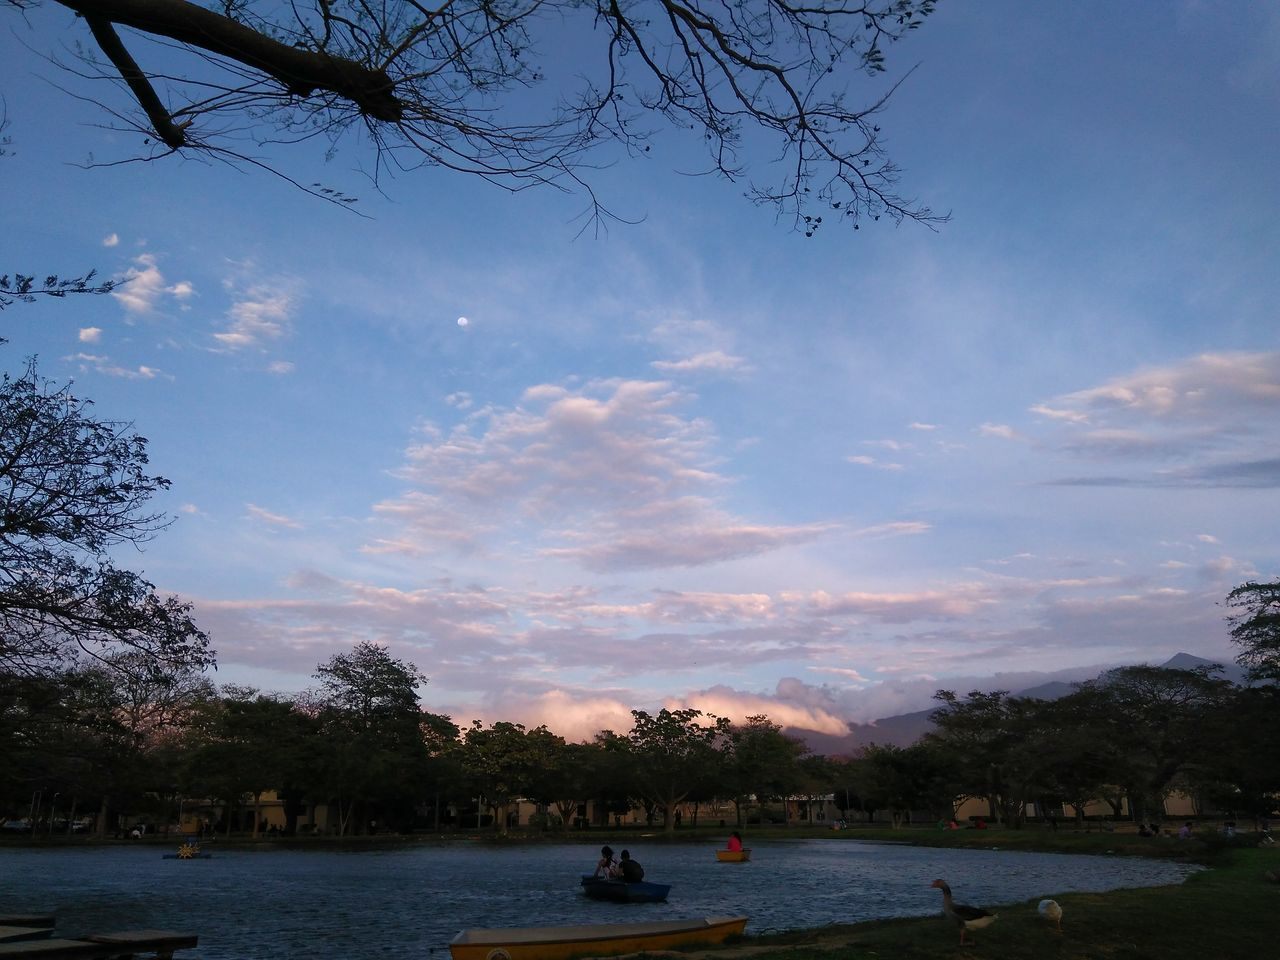 Tree Water Sky Outdoors Nature Moon Snapseed EyeEm Sunset Eyeemphotography F4F